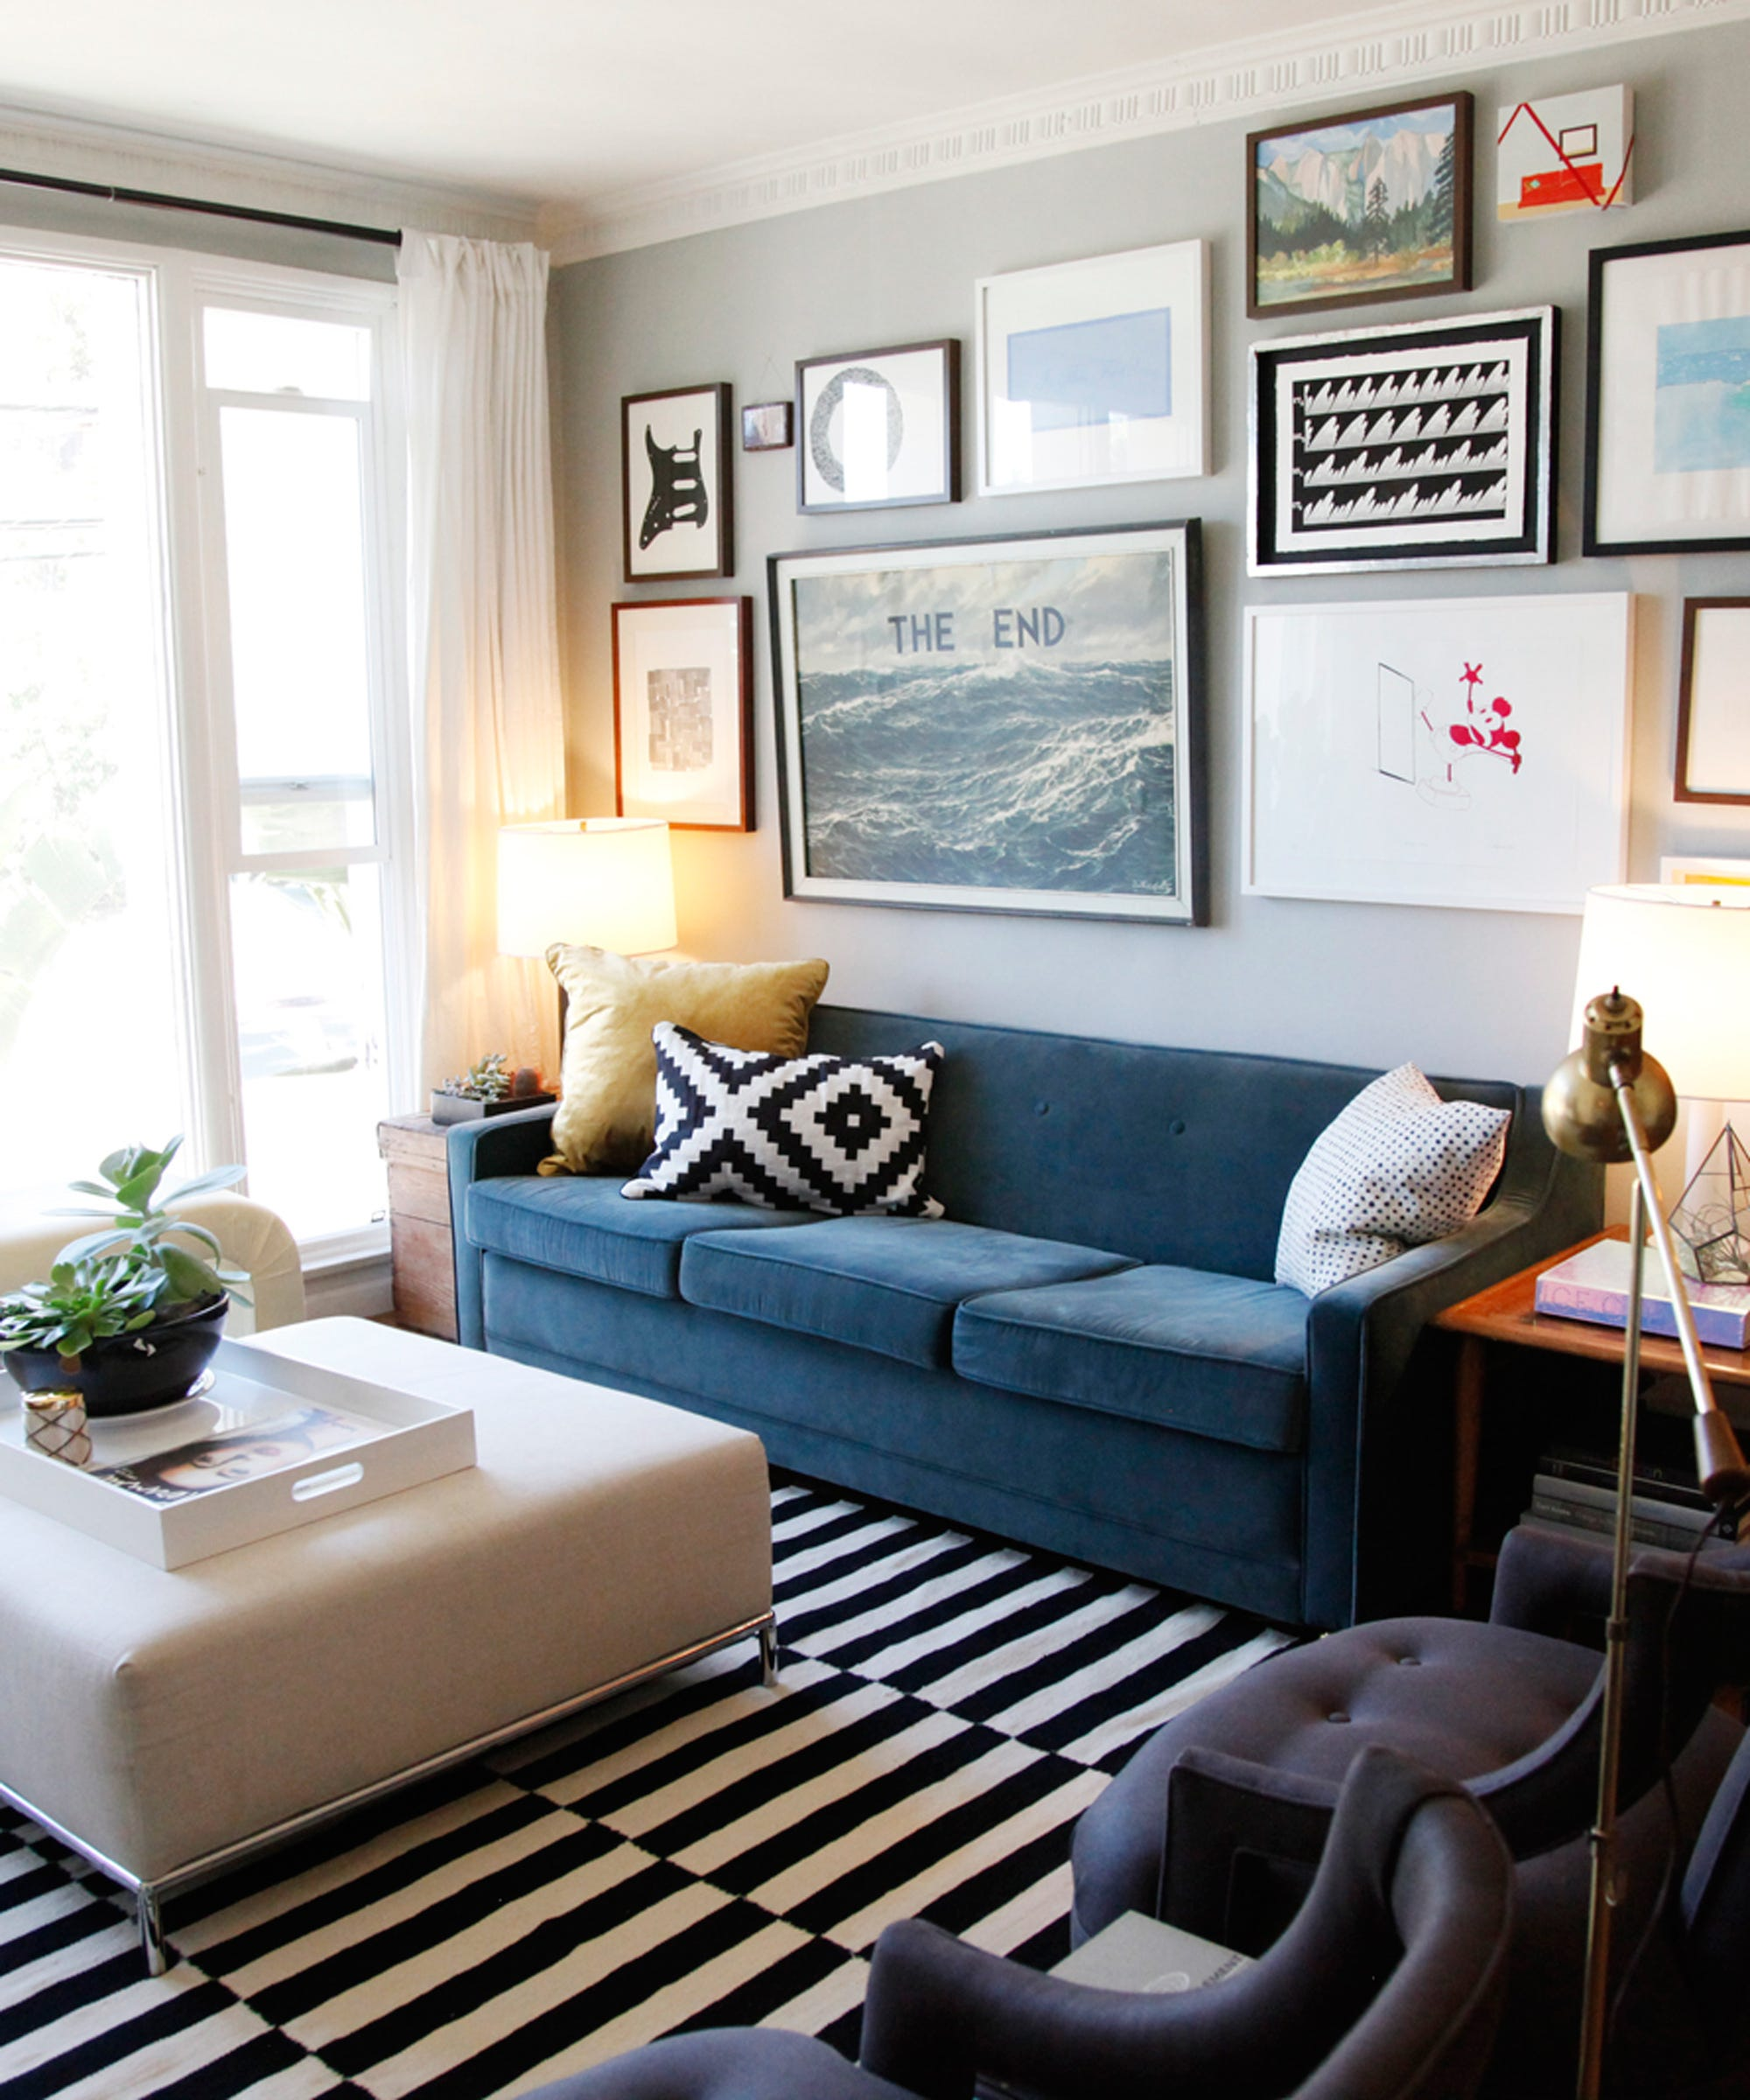 Cheap Home Decor Stores - Best Sites, Retailers on home lighting ideas, studio apt furniture ideas, home interior design ideas,